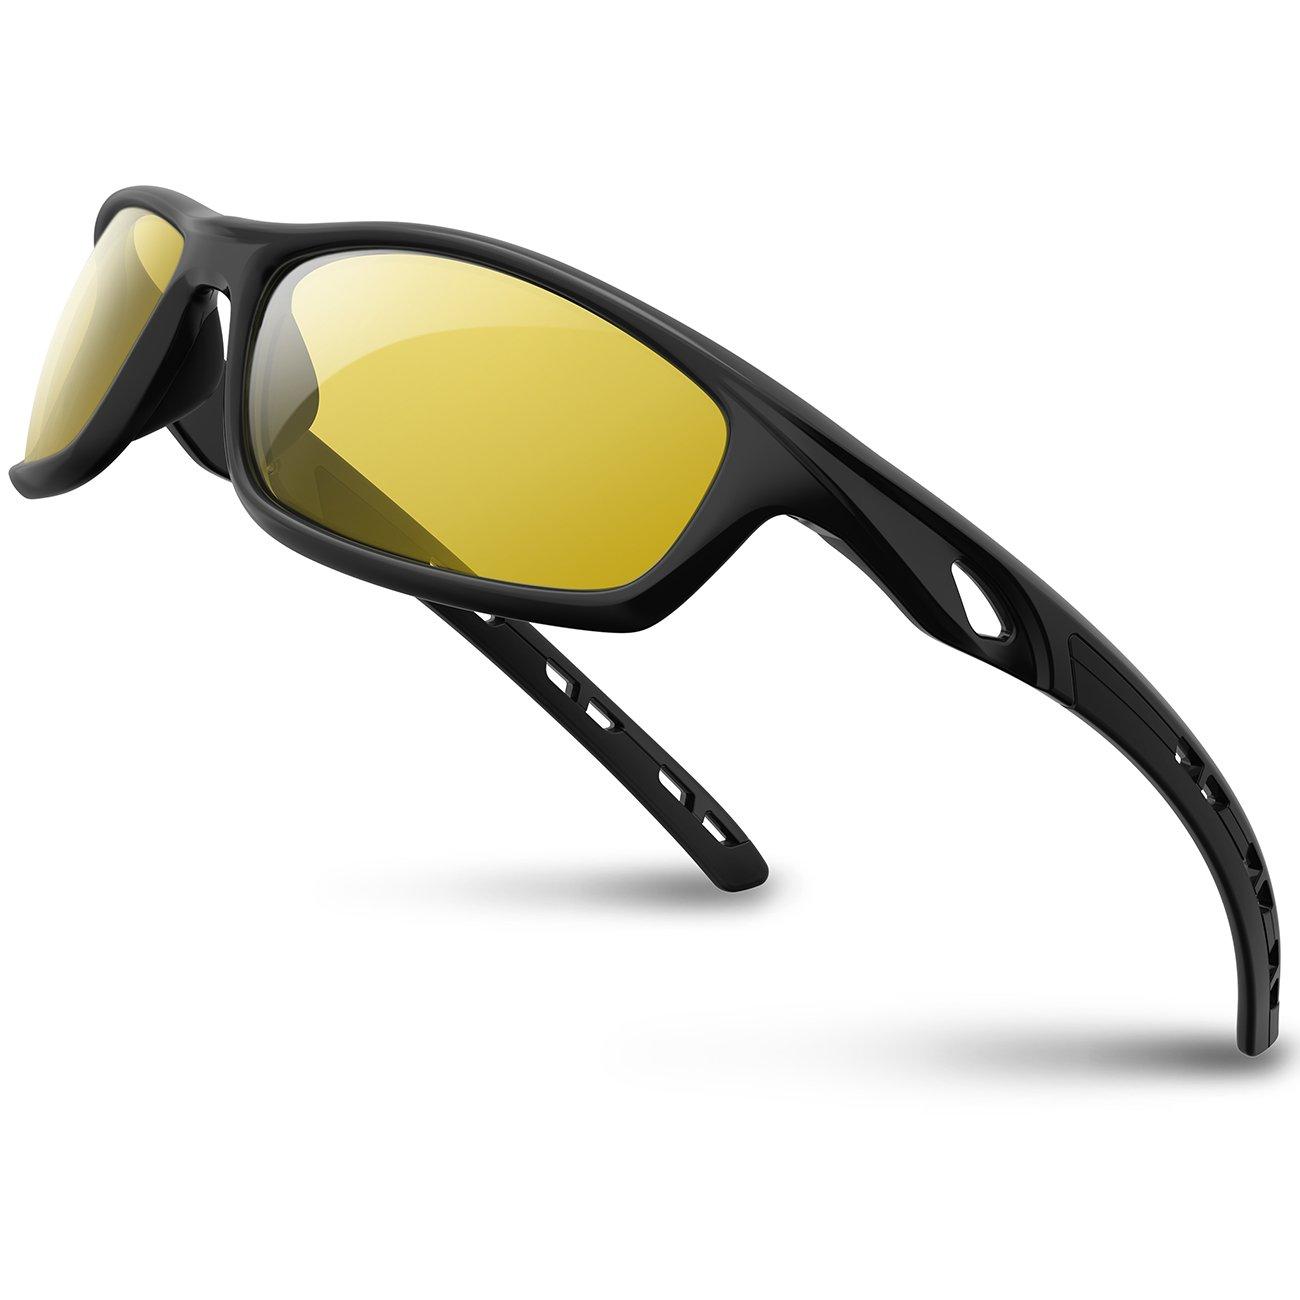 RIVBOS偏光スポーツサングラス運転SunメガネメンズレディースTR 90アンブレイカブルフレームfor Cycling野球Running rb833  833-black night version lens B07C2X1WH9